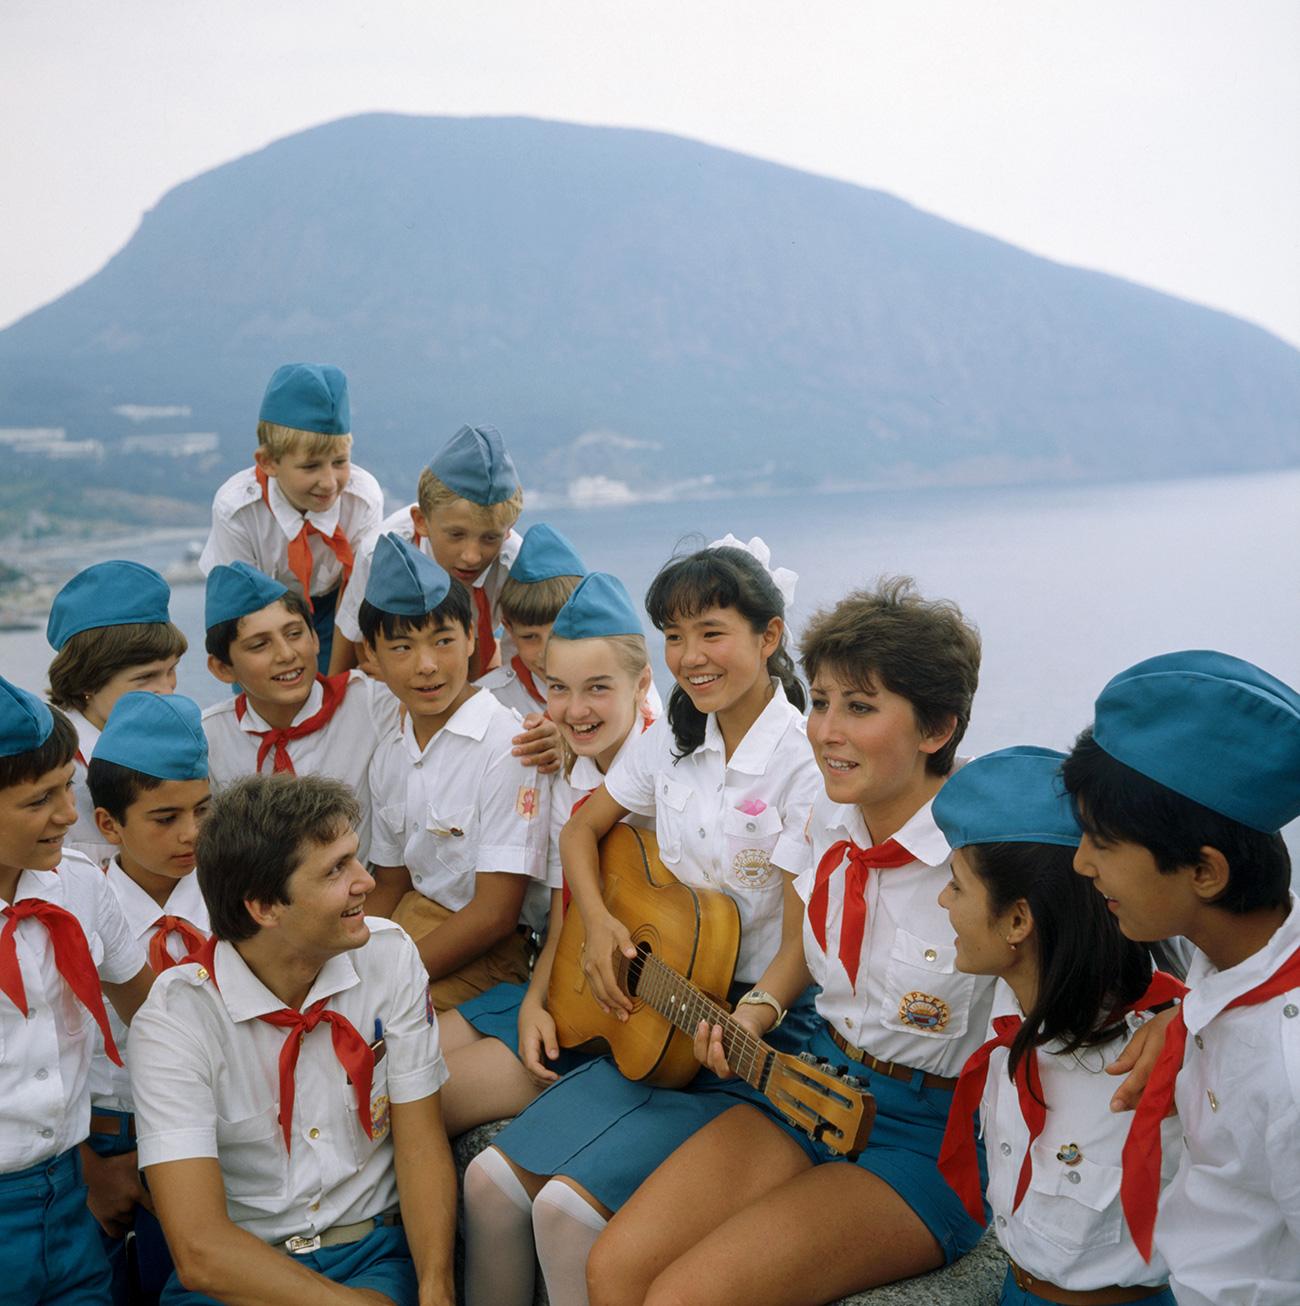 Ketika sebuah kamp Gerakan Pionir telah usai, anak-anak akan menuliskan nama dan alamat masing-masing pada dasi-dasi mereka untuk bertukar surat dan tetap berhubungan saat mereka kembali ke rumah.